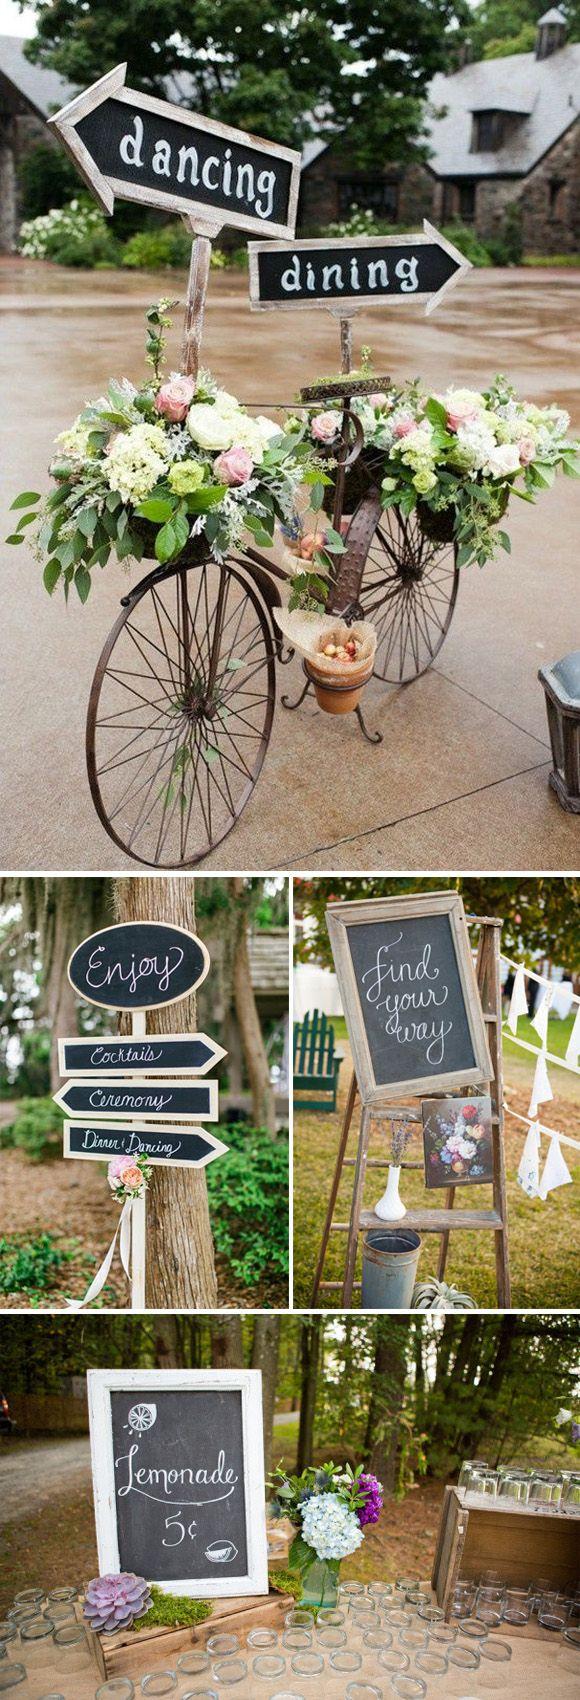 Carteles para decorar tu boda wedding decor ideas - Decorar tu boda ...